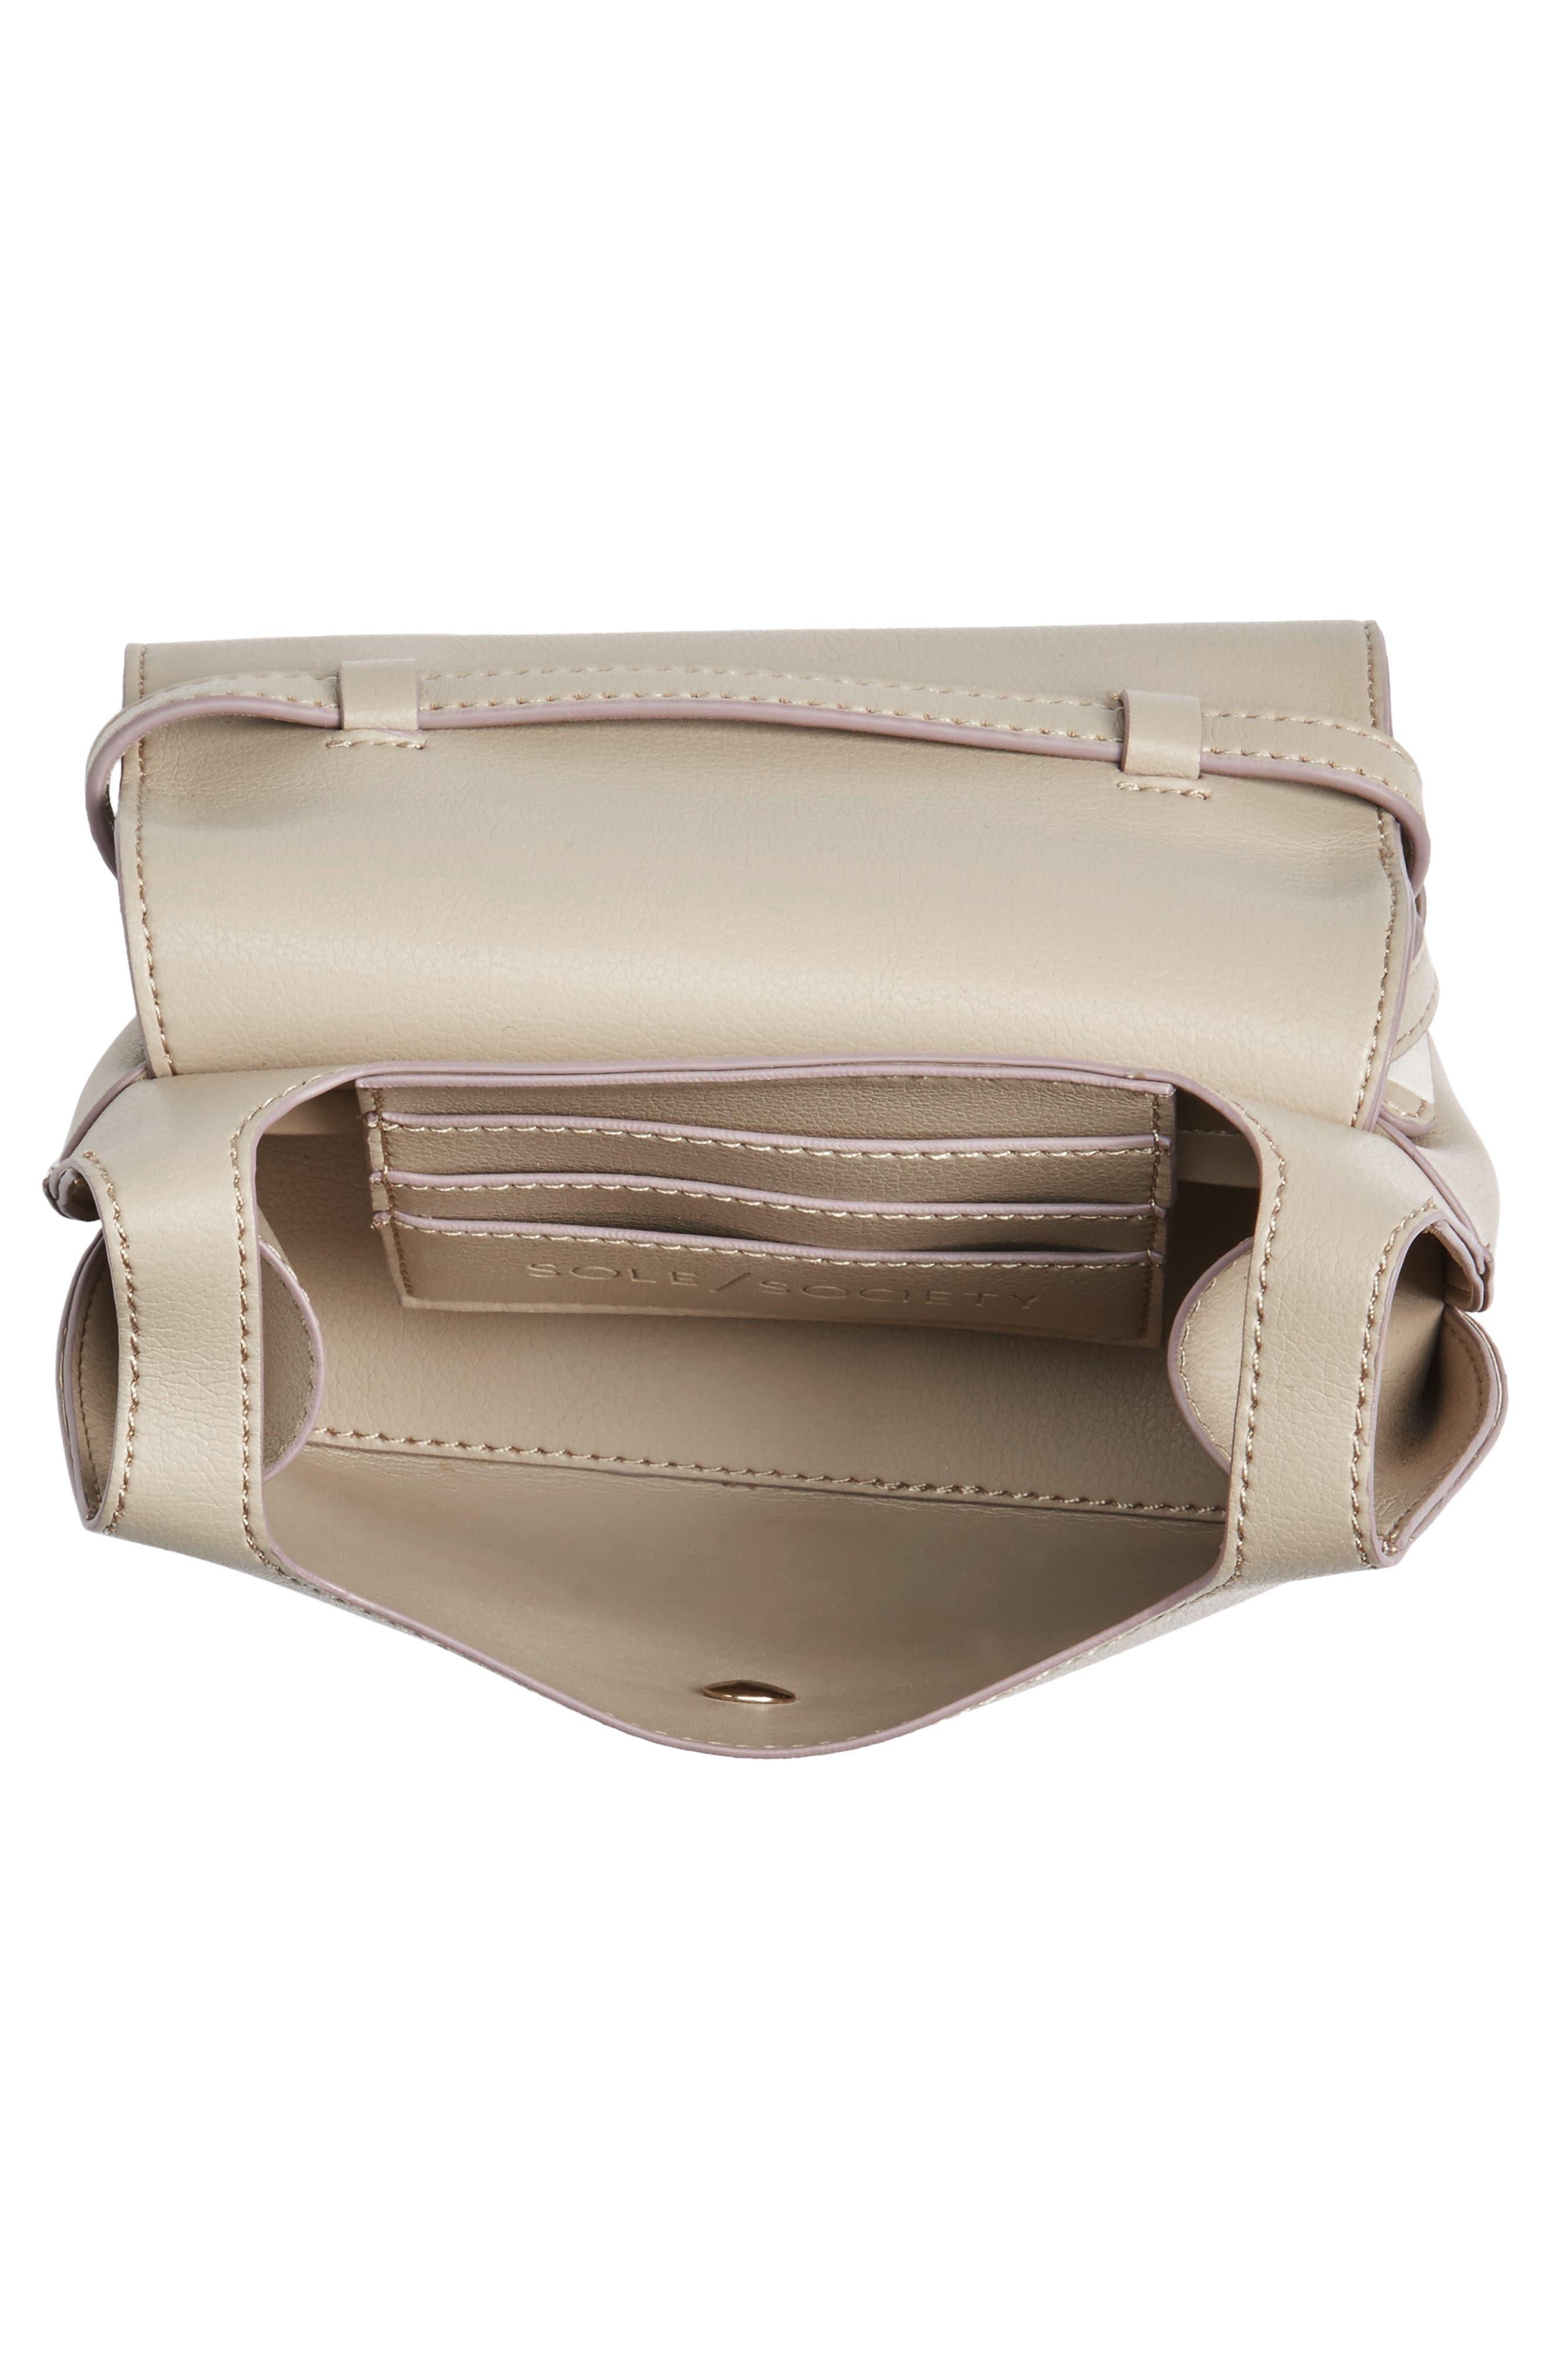 Mini Chino Crossbody Bag,                             Alternate thumbnail 4, color,                             020